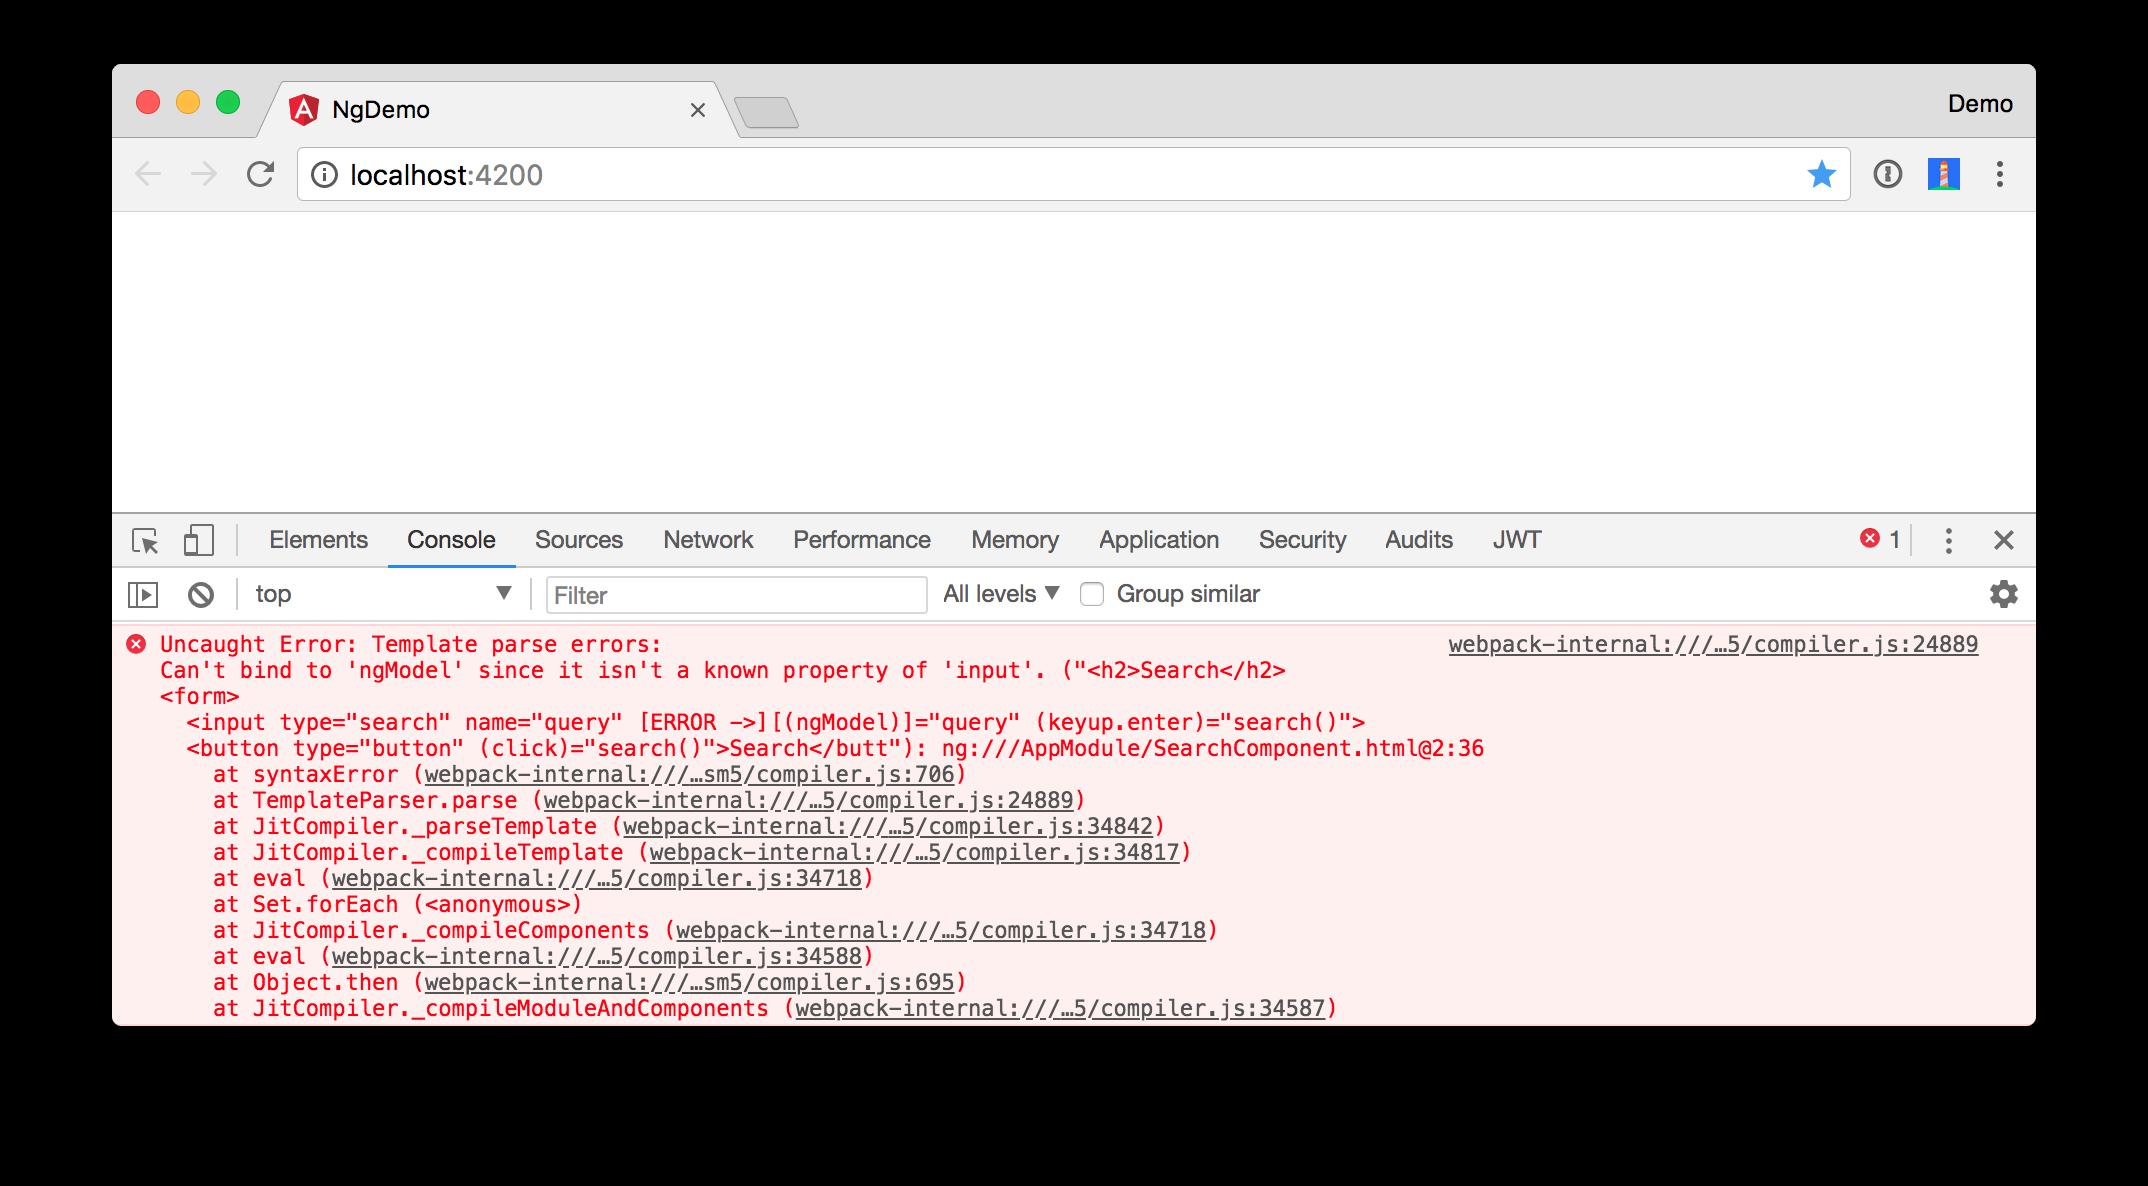 ngModel error